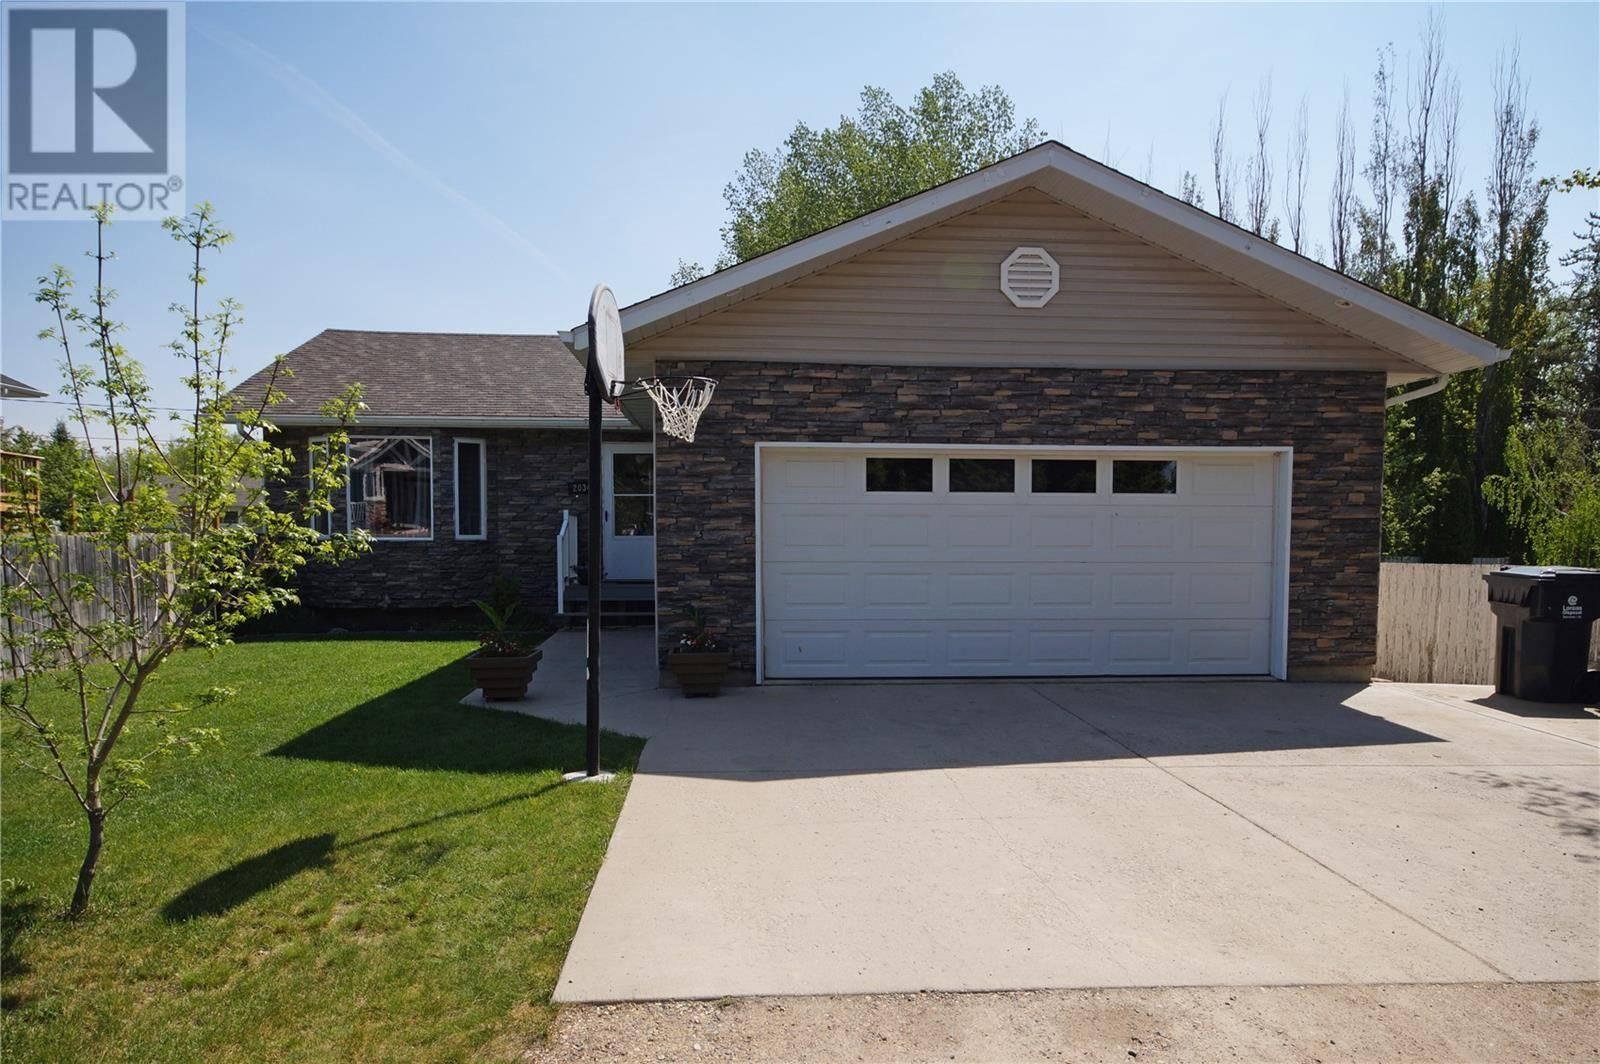 House for sale at 2034 Pineridge Cres Waldheim Saskatchewan - MLS: SK773611